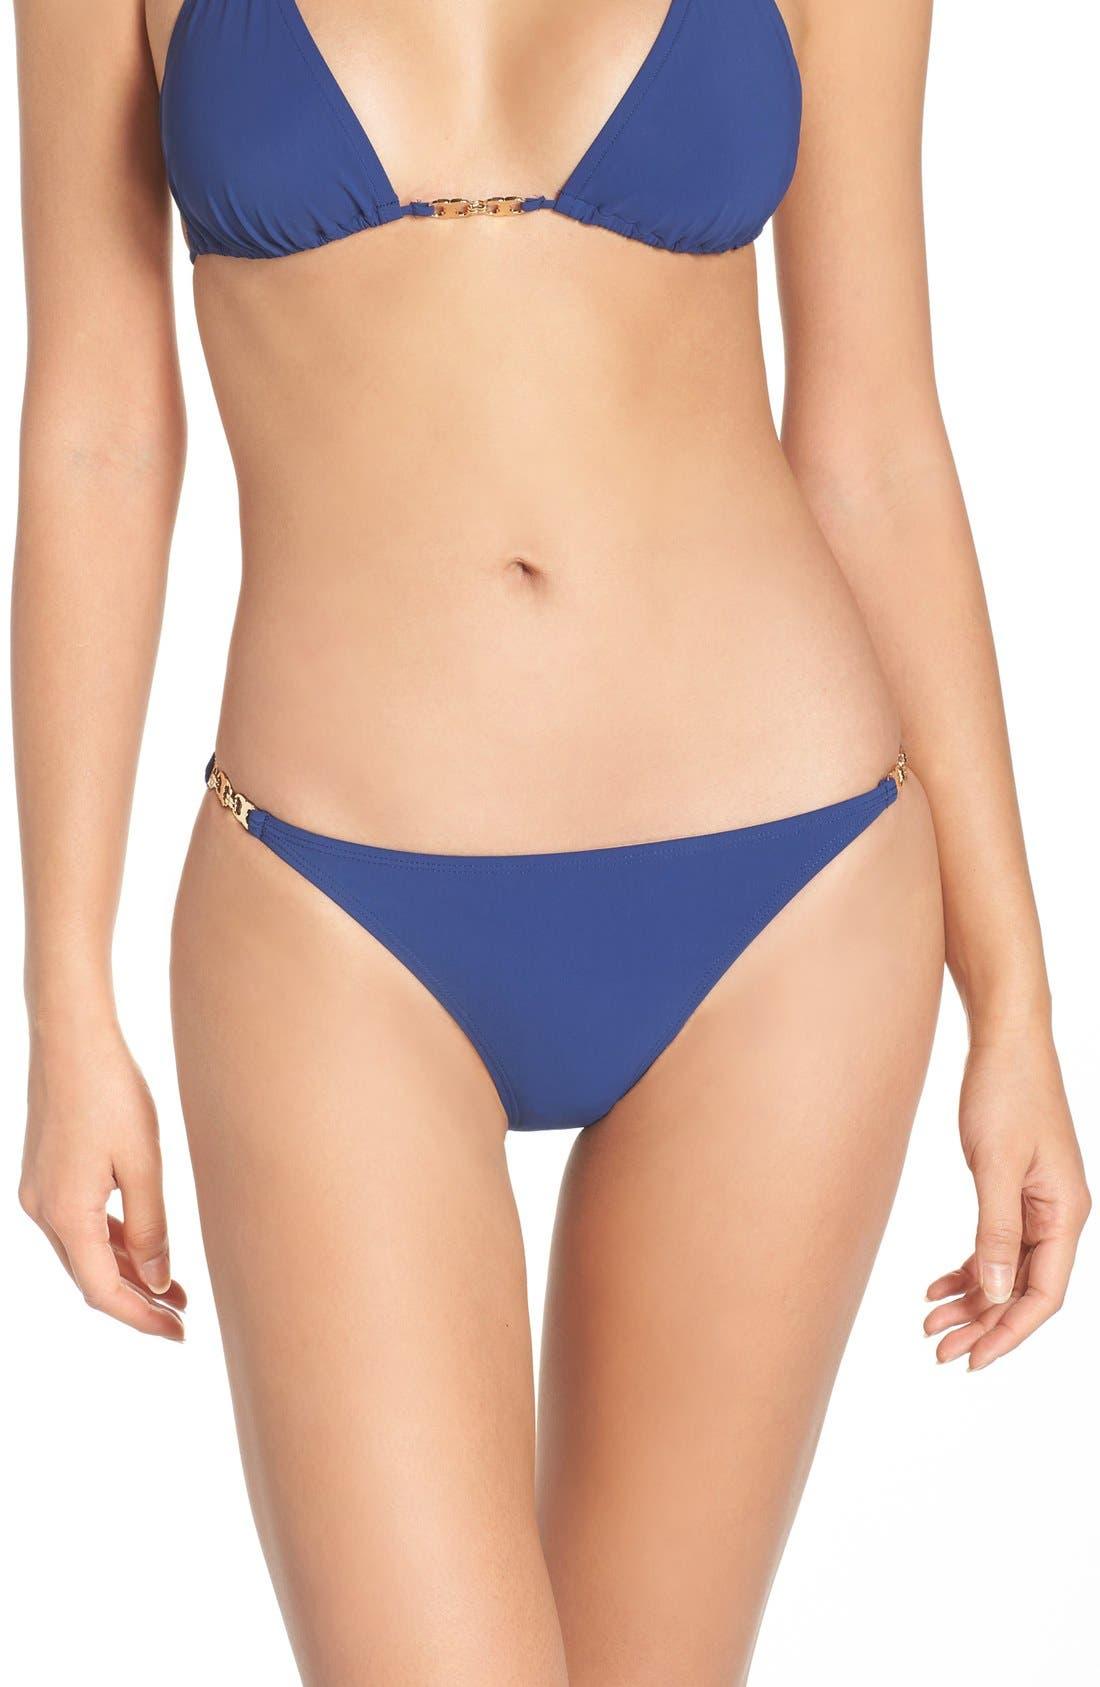 Tory Burch Gemini Link Bikini Bottoms